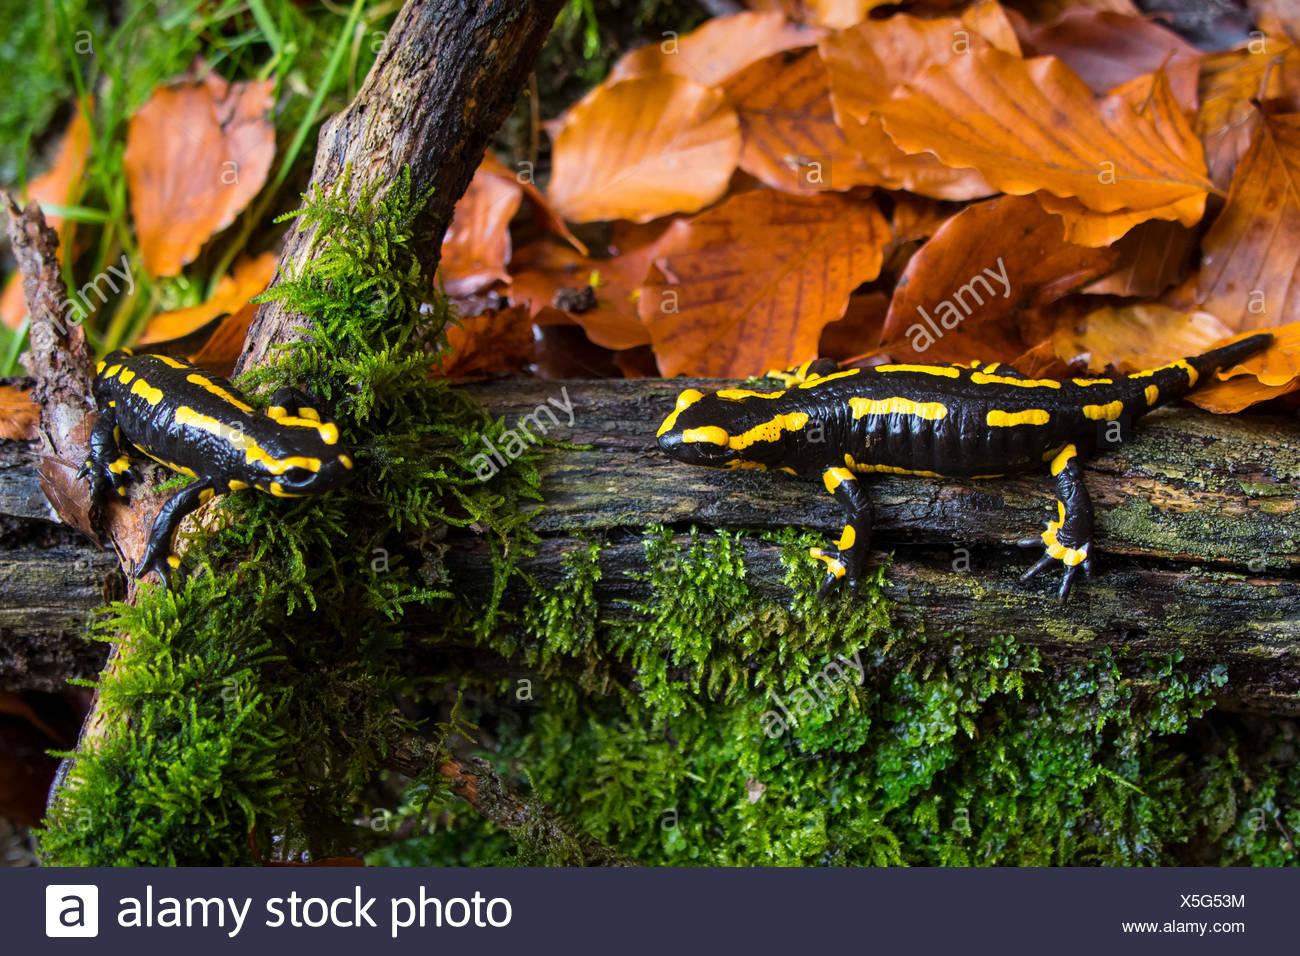 European fire salamander (Salamandra salamandra), two individuals on a dead wood, Switzerland, Sankt Gallen - Stock Image